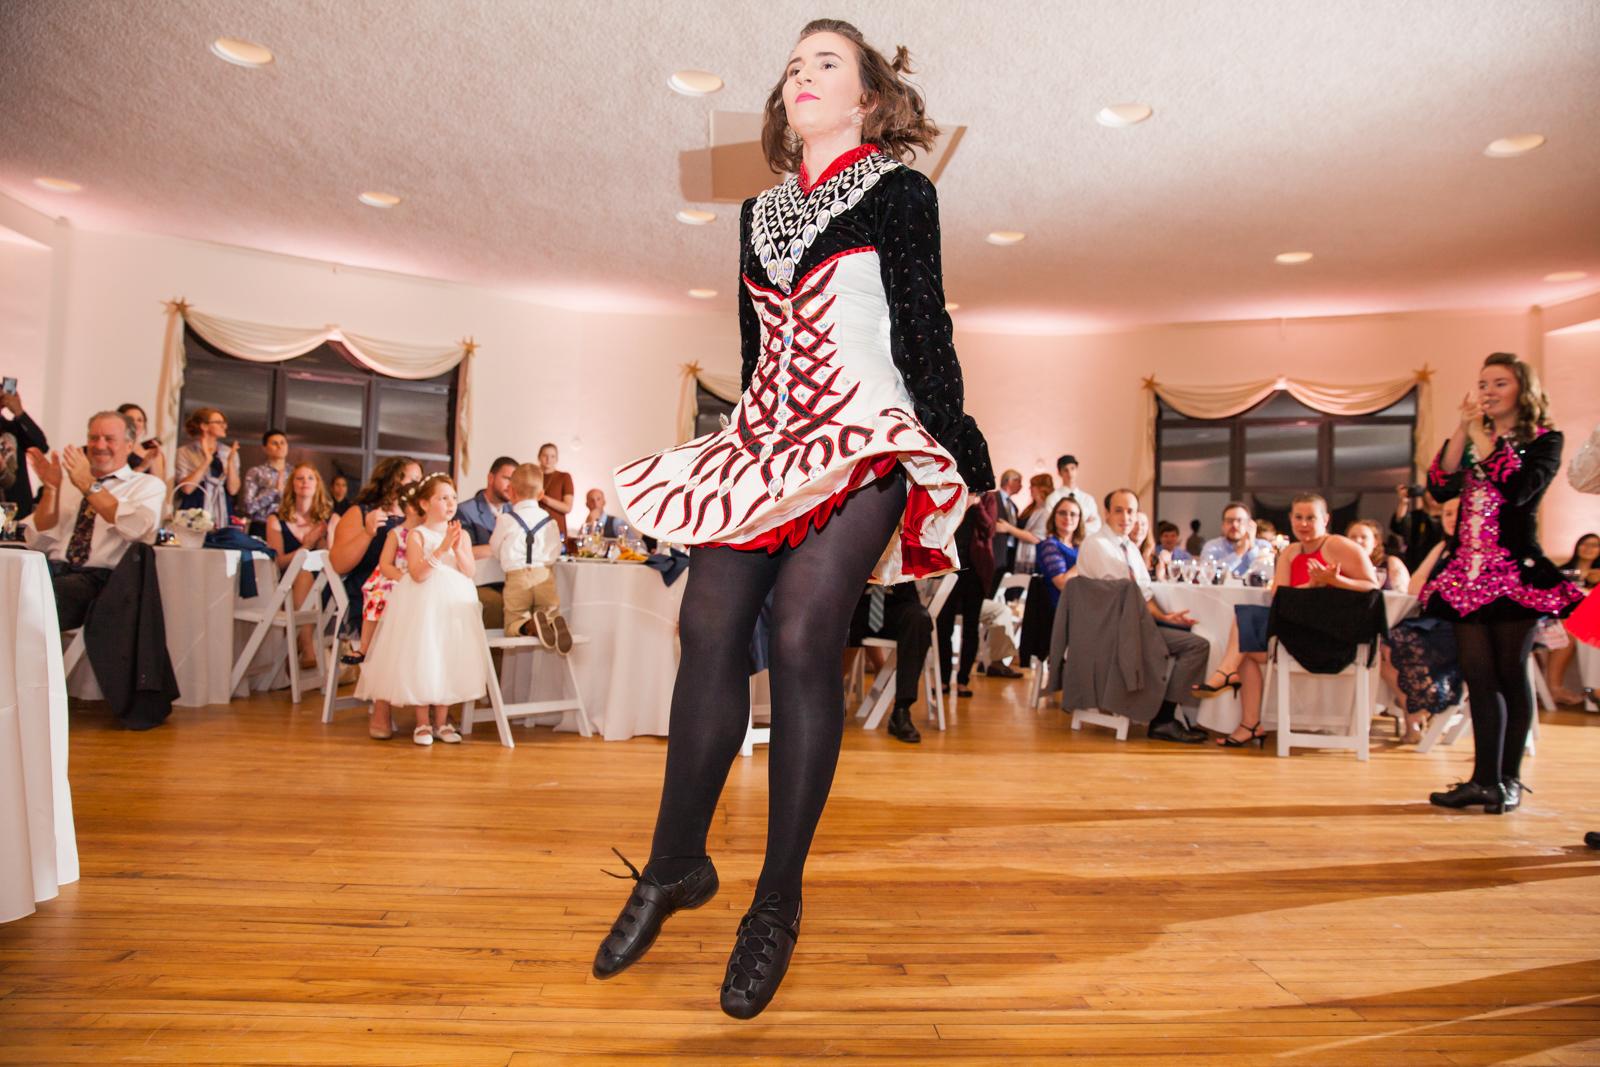 Eastons-Beach-Rotunda-Ballroom-Wedding-Newport-Rhode-Island-PhotographybyAmandaMorgan-108.jpg